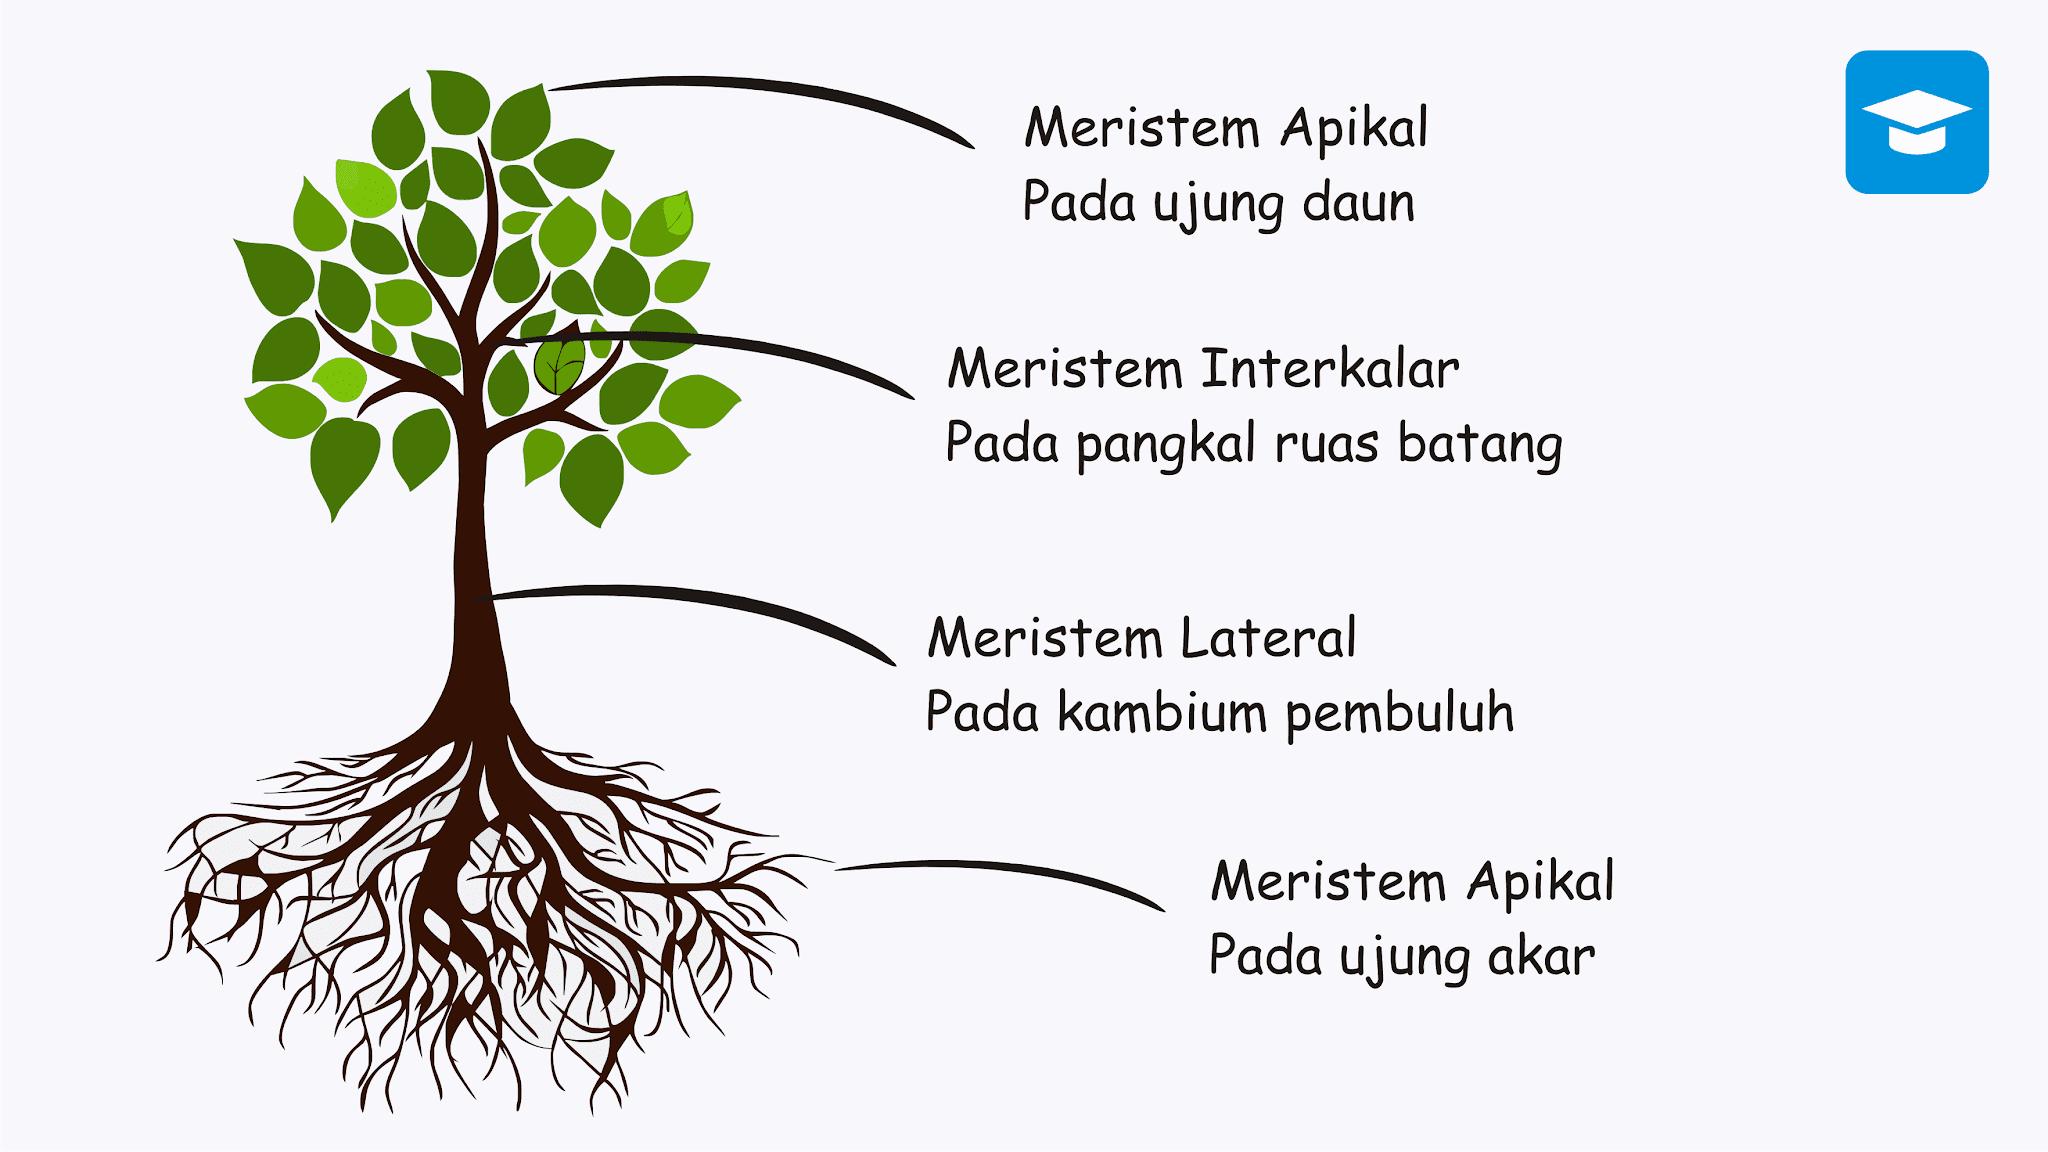 Struktur fungsi jaringan tumbuhan